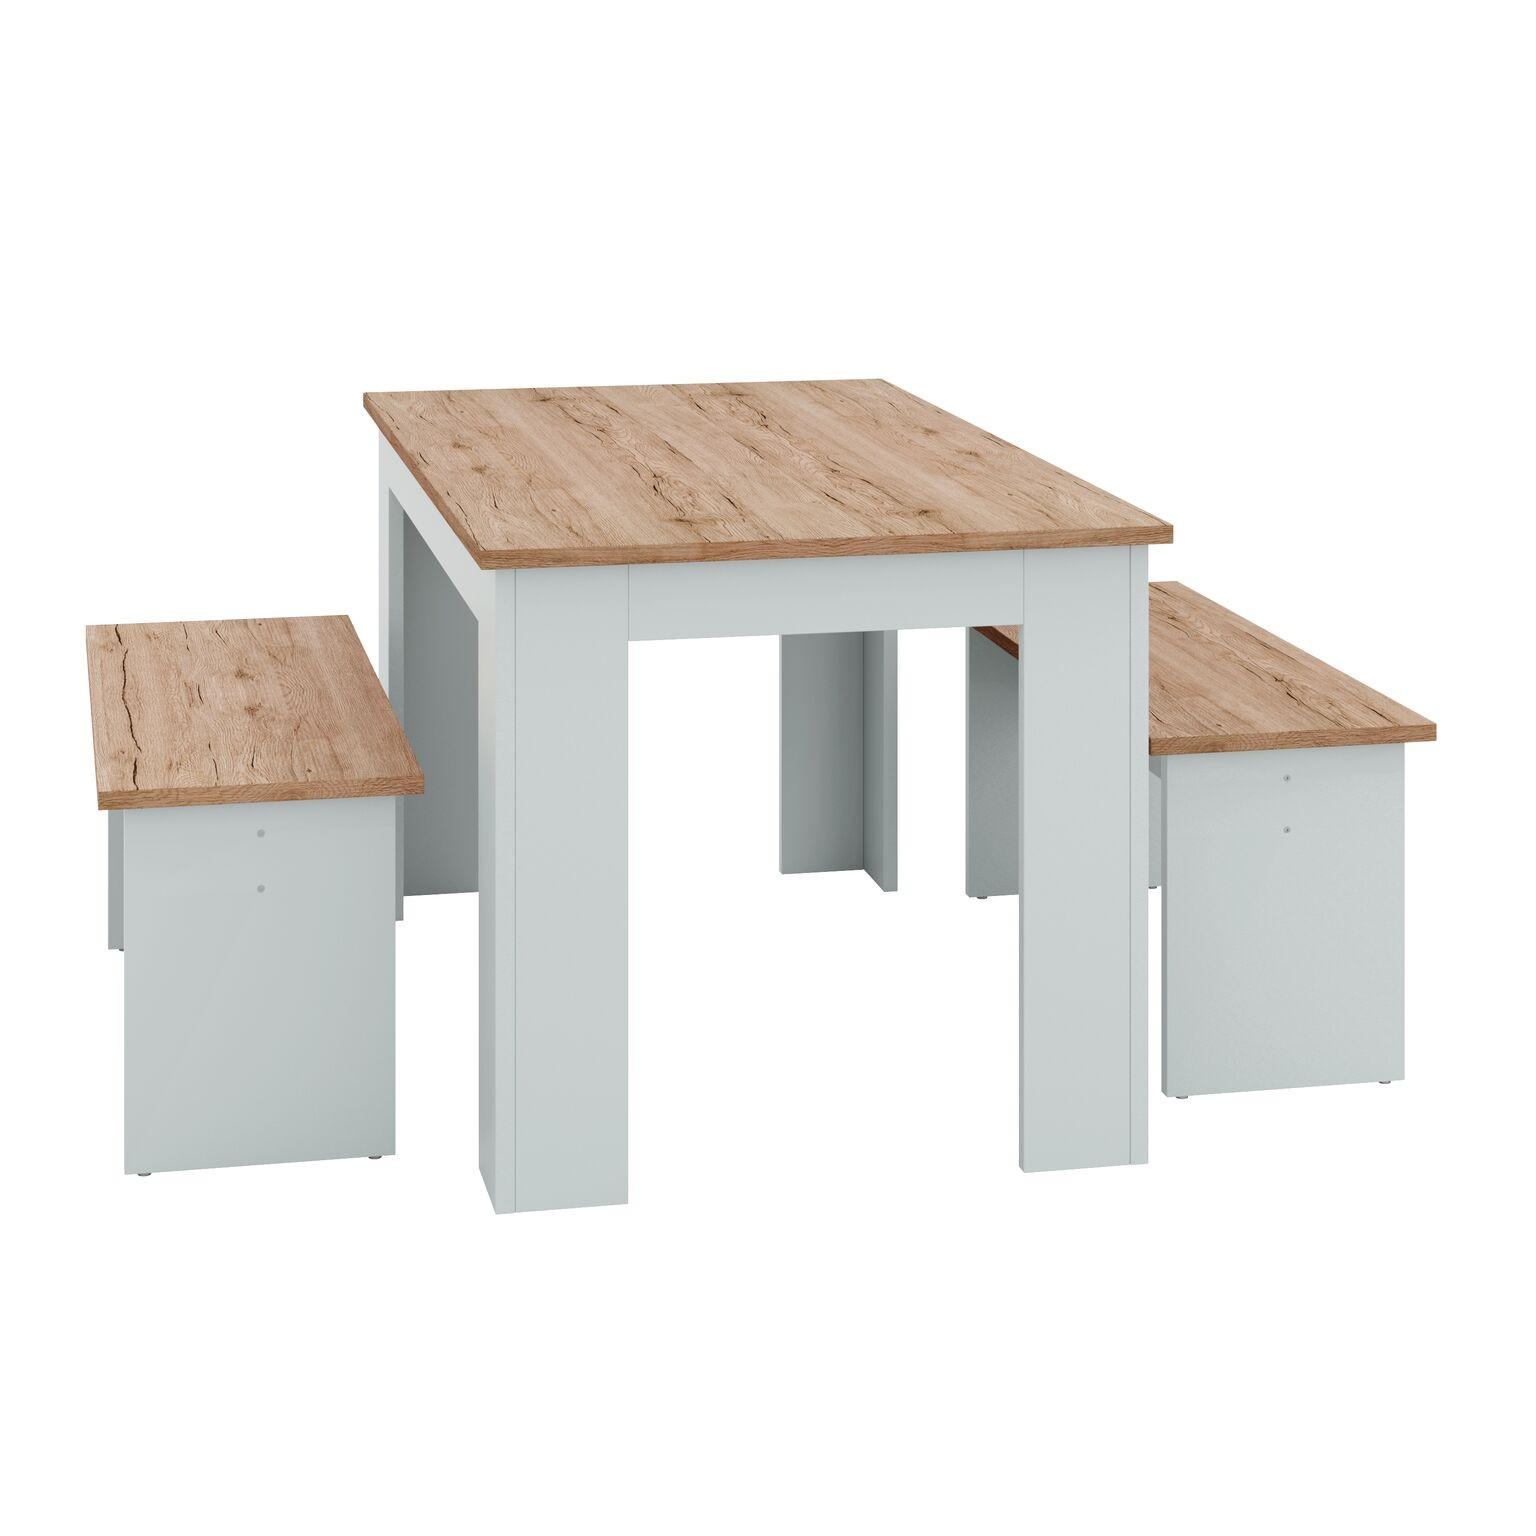 Dorchester Table & Bench Set